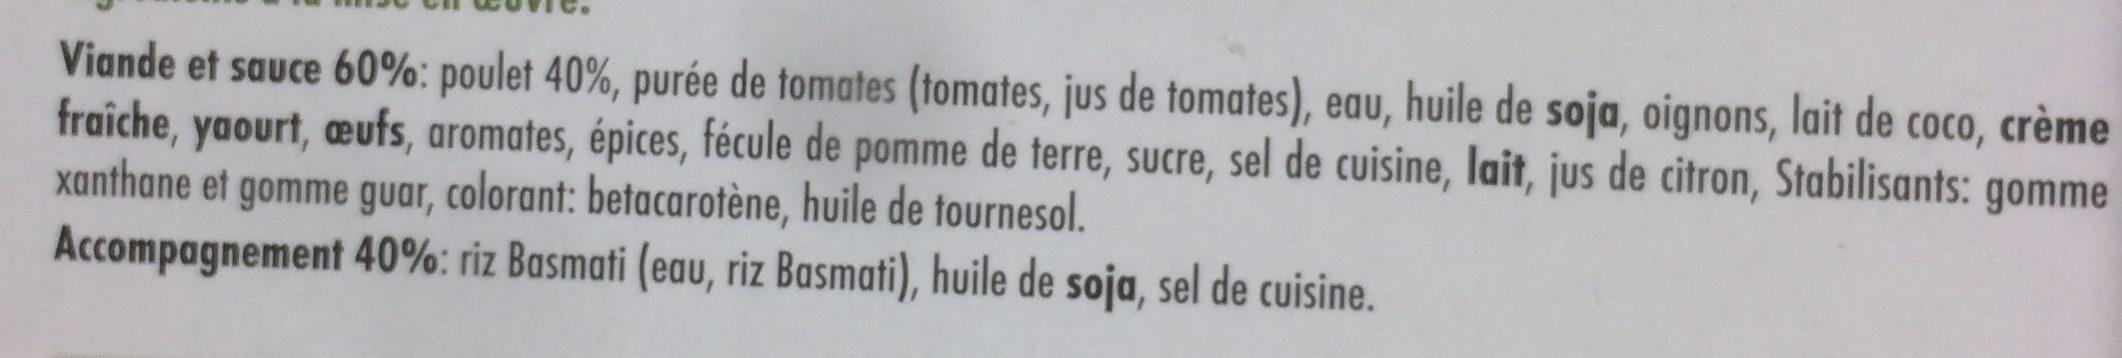 Poulet Korma et Riz Basmati - Ingrédients - fr